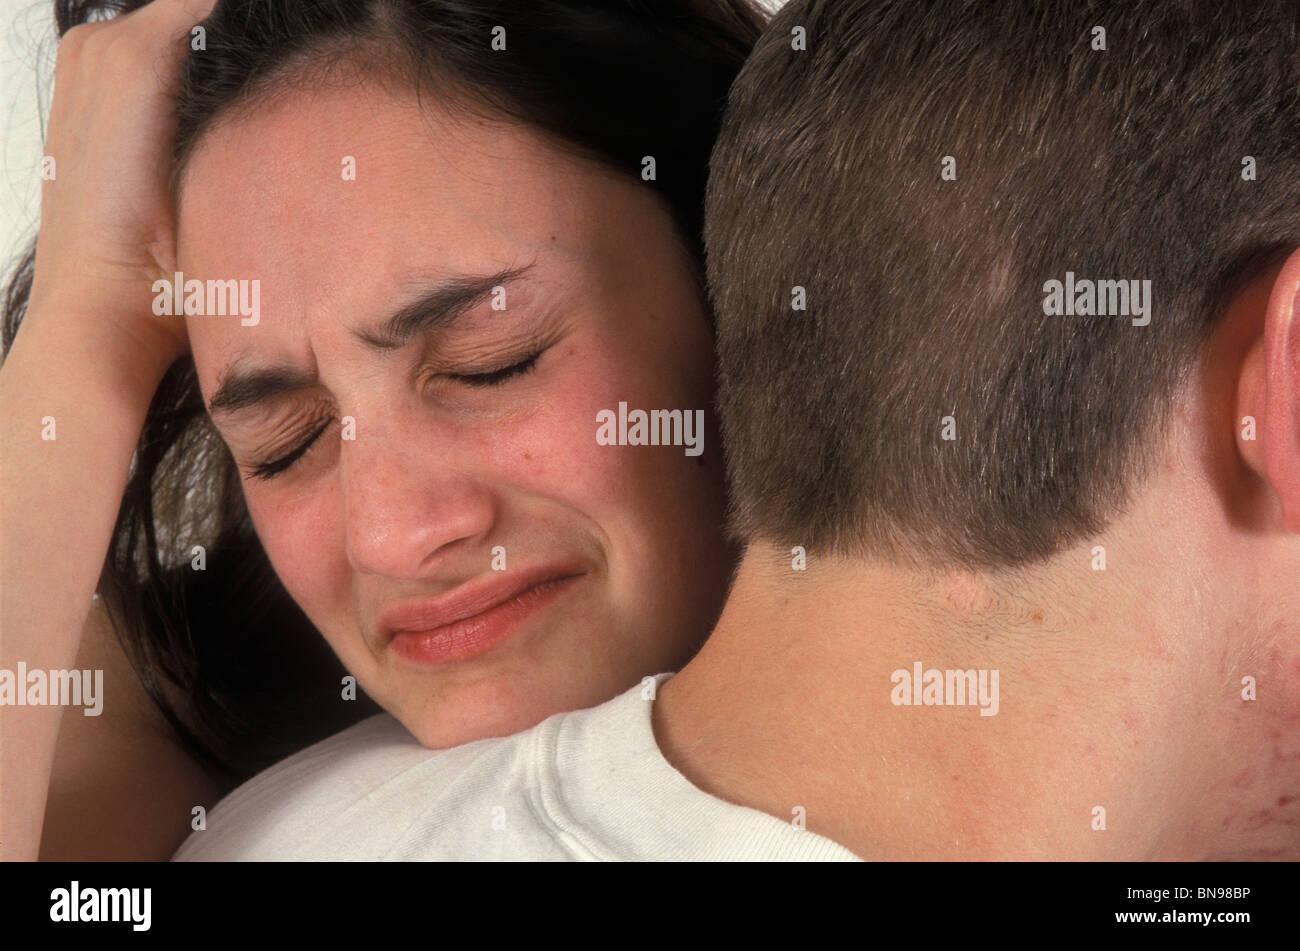 Distressed teenage girl clinging onto boyfriend - Stock Image